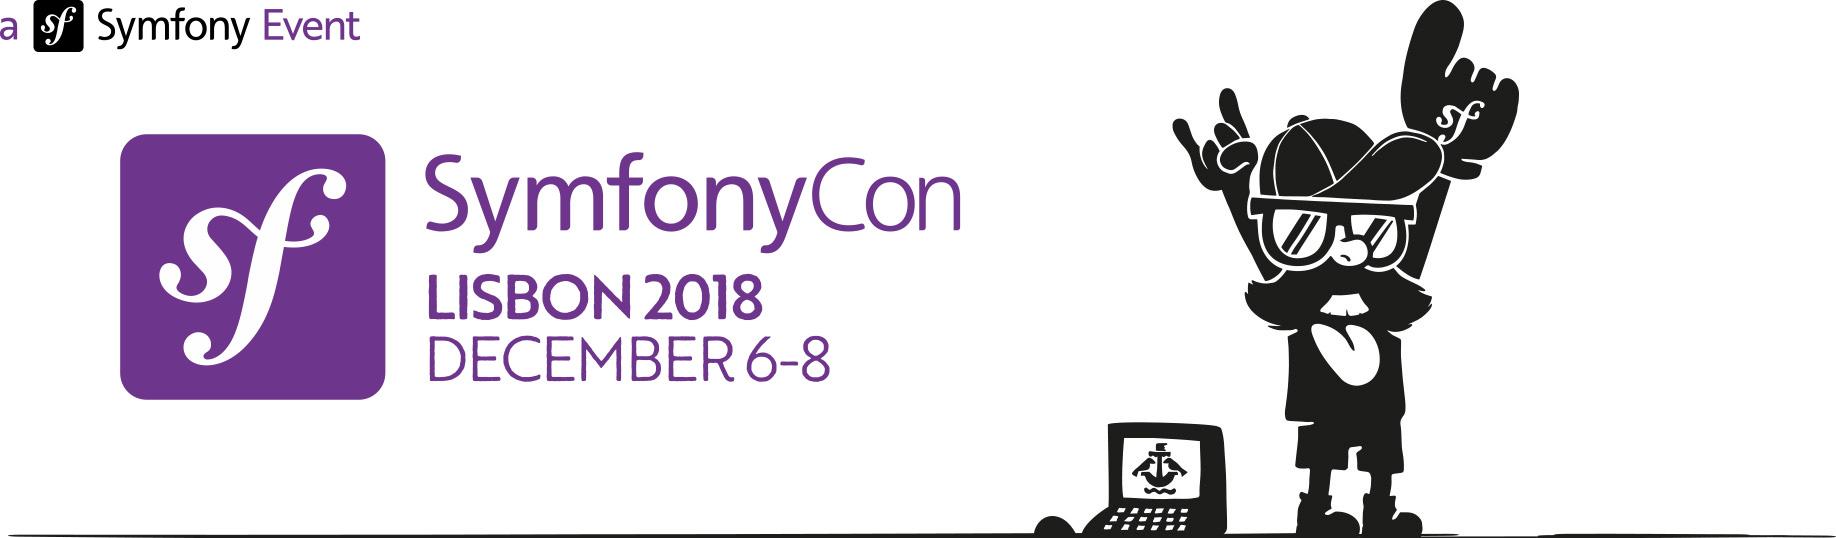 SymfonyCon Lisbon 2018